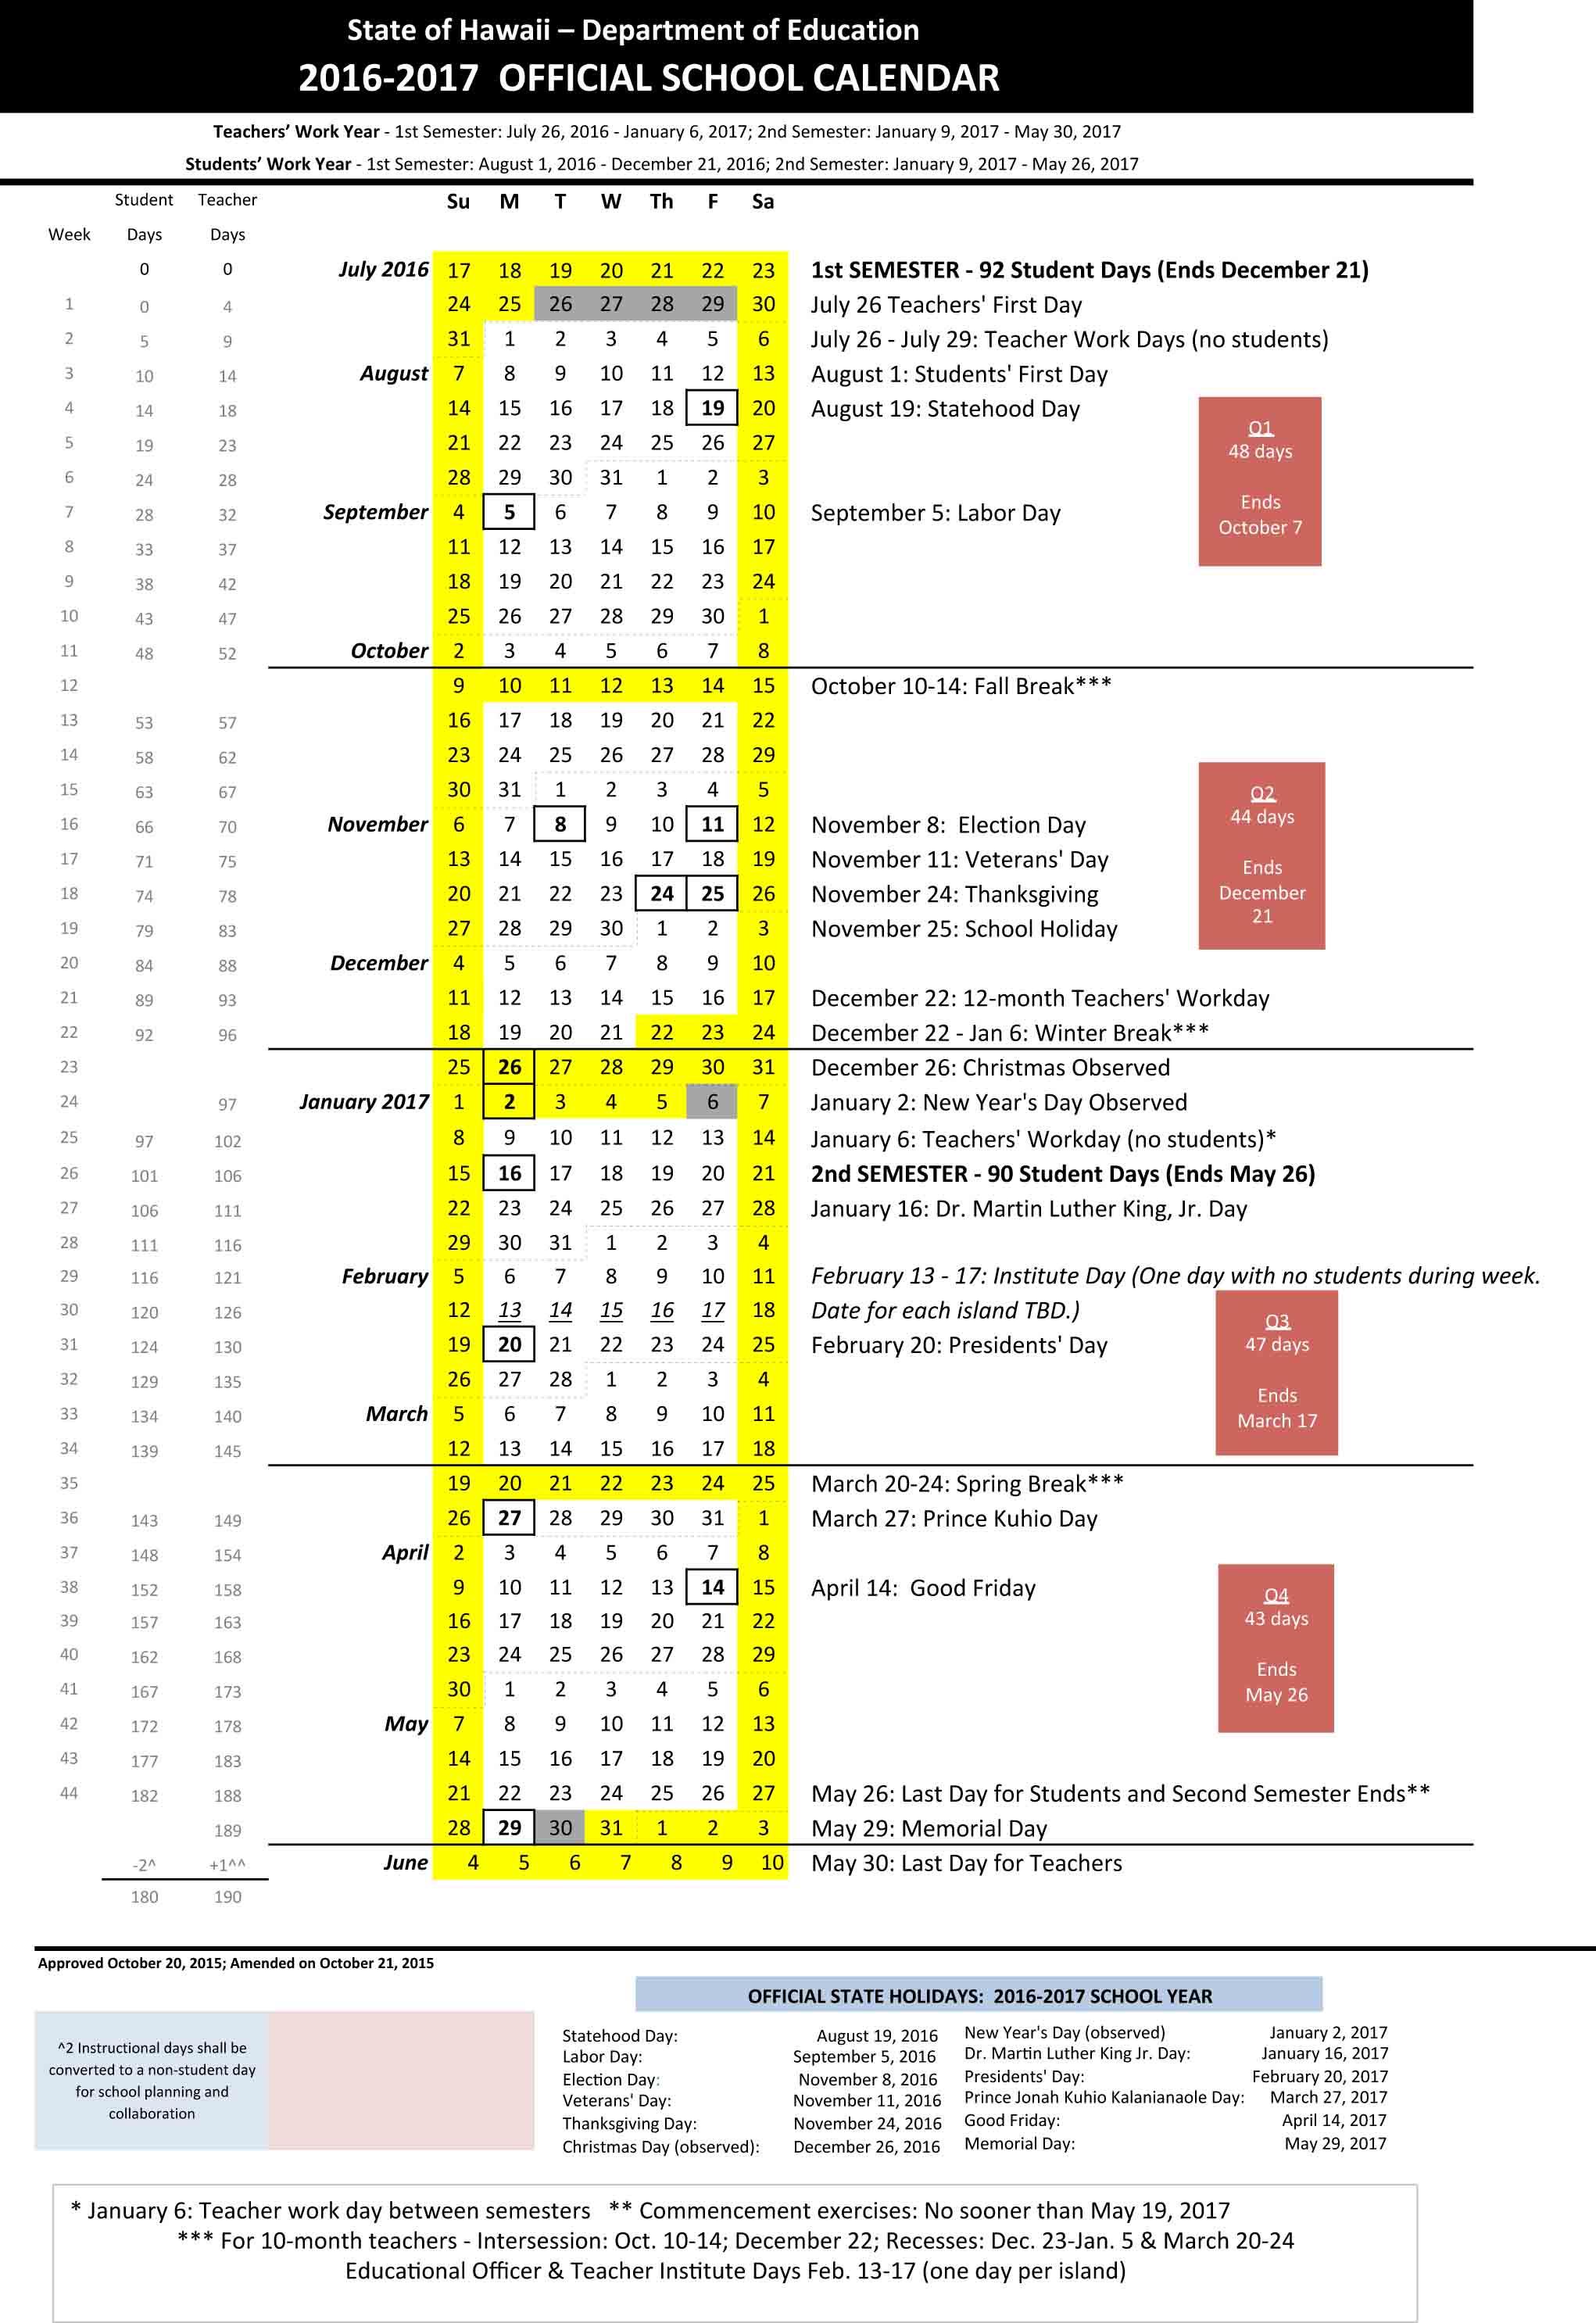 School Calendar 2016 17 : State of hawaii doe school calendar maui family